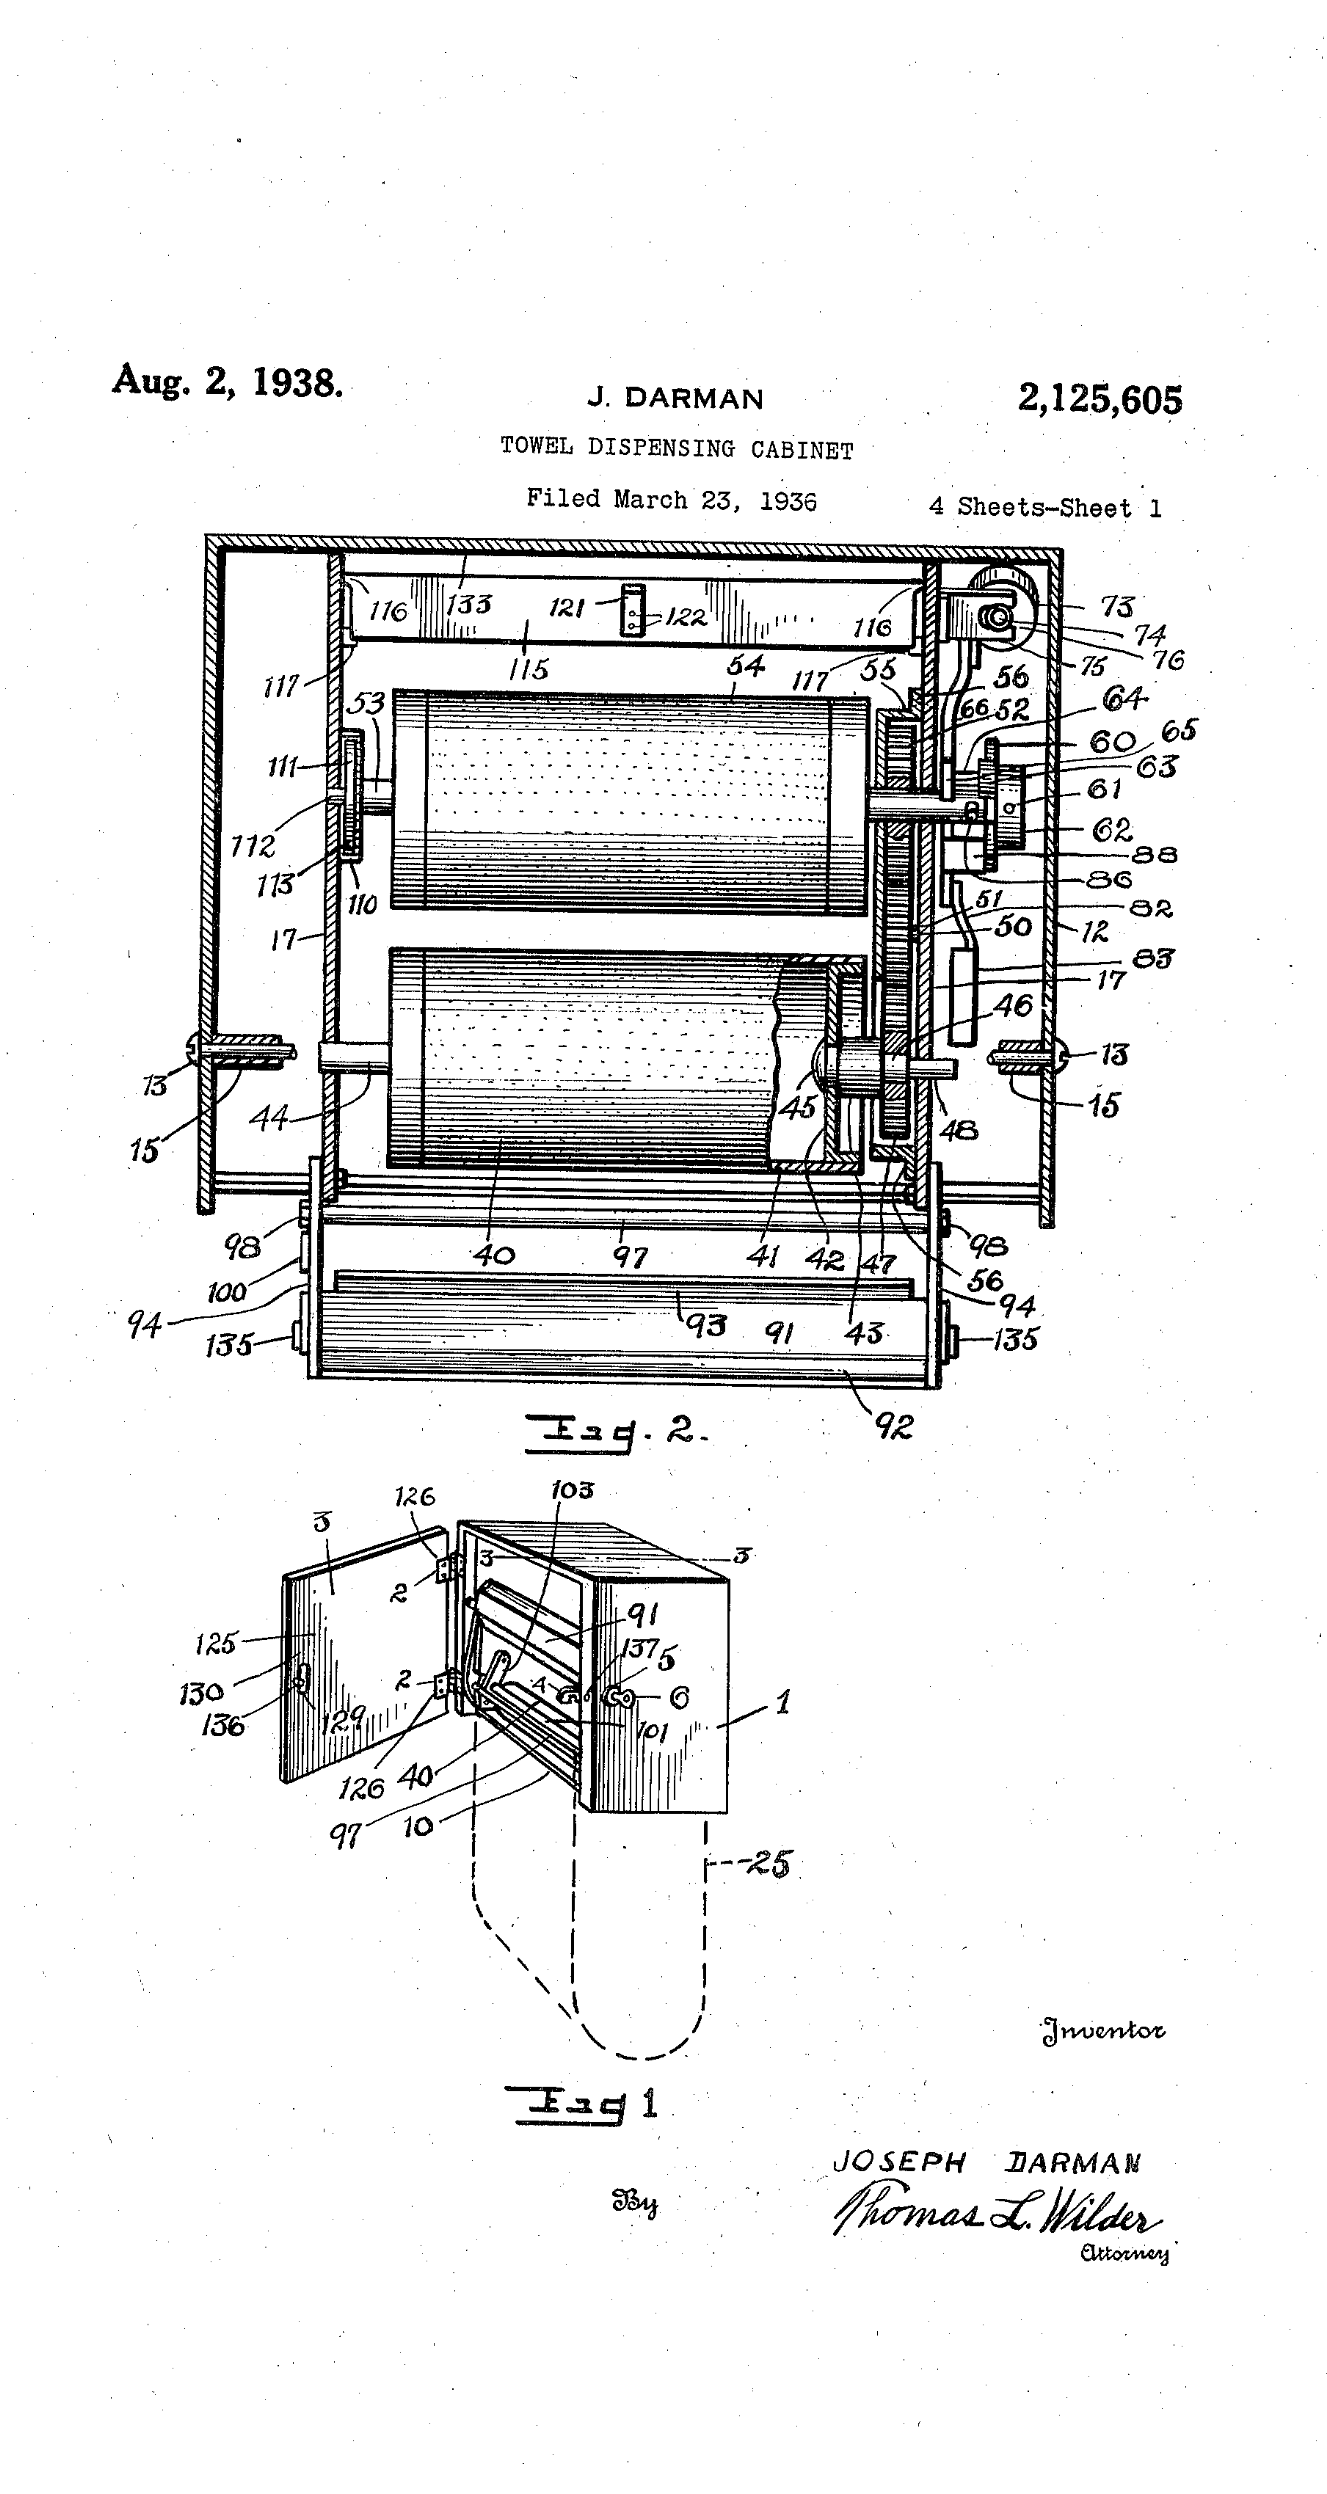 cloth roll towel dispenser-single service towel-sst-paper towel dispenser-hand drying methods-electric air dryer-air dryer